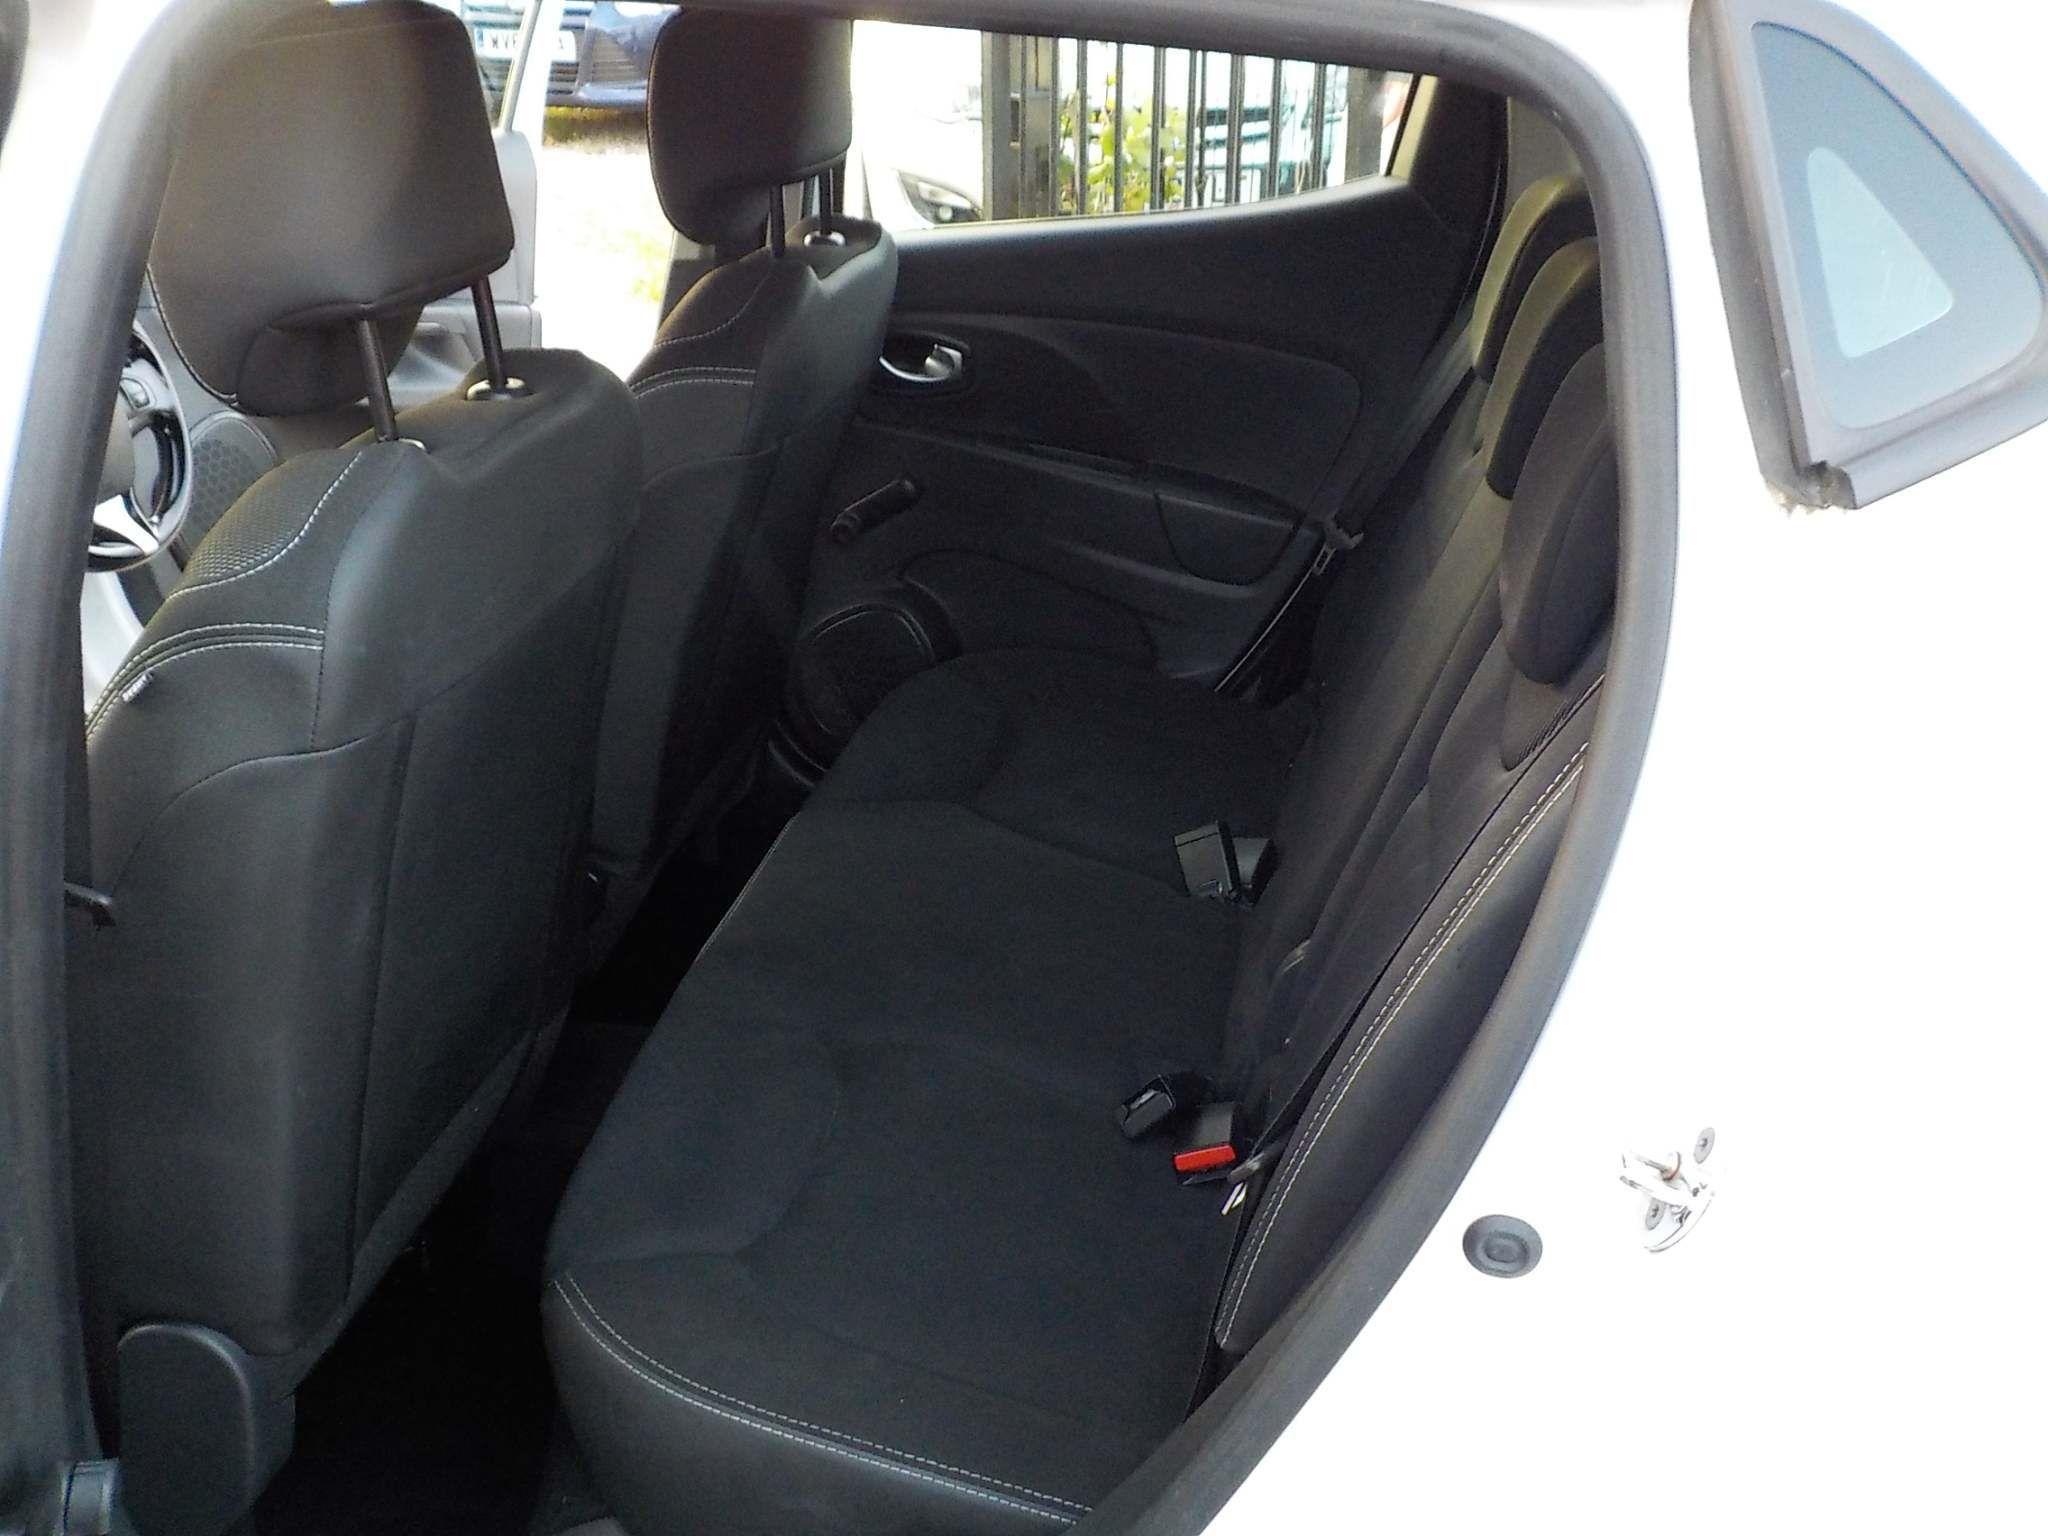 Renault Clio 0.9 TCe Dynamique MediaNav (s/s) 5dr